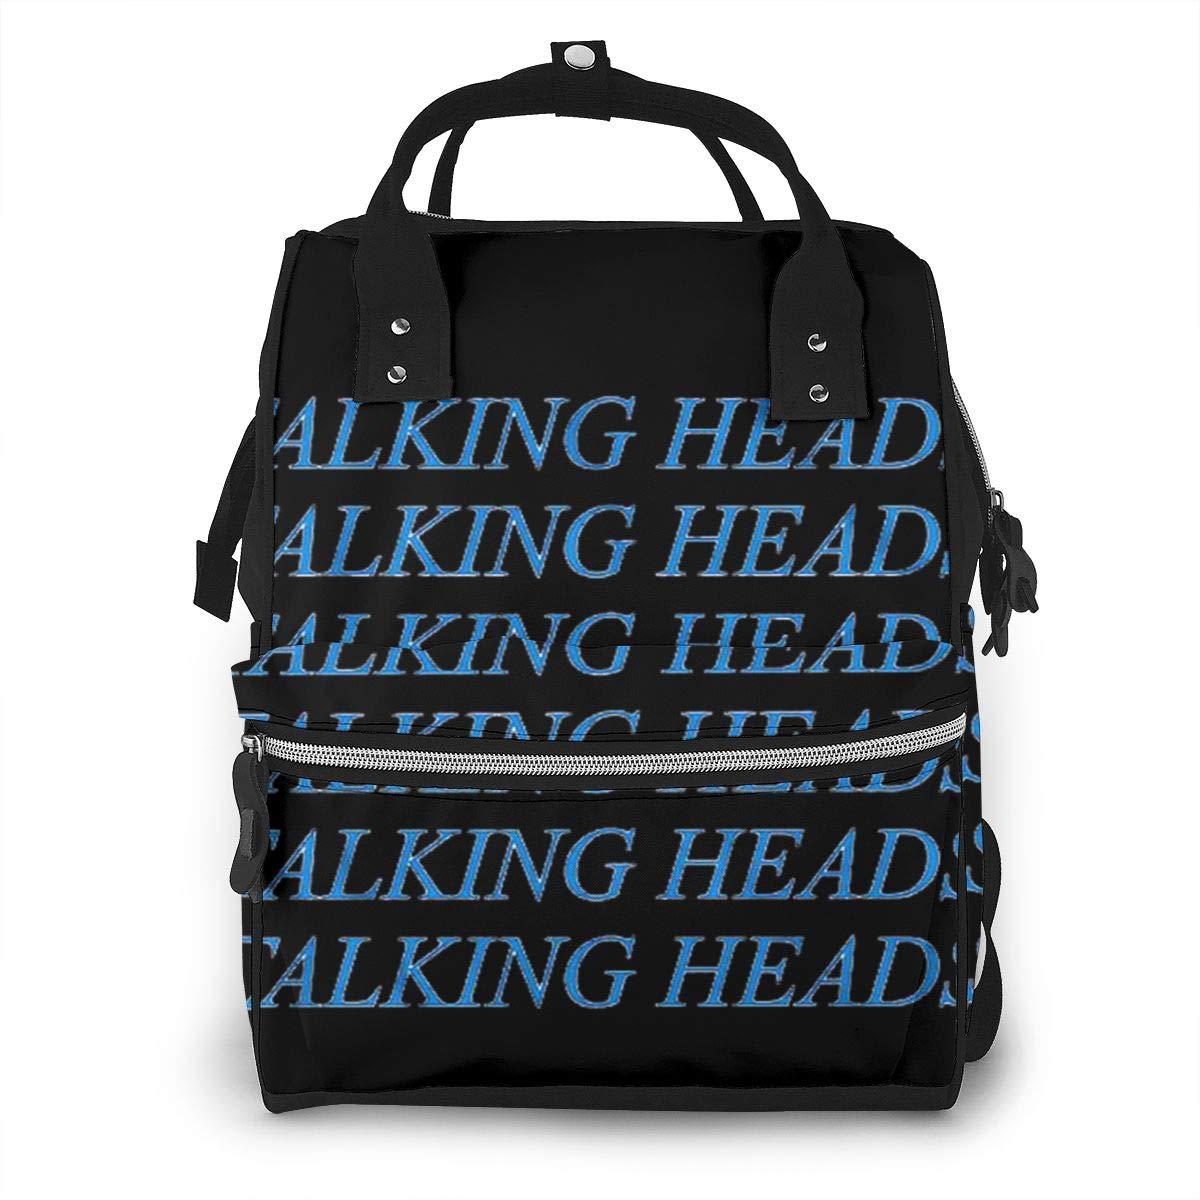 Talking Heads Personalized Design, Durable, Large Capacity, Stylish, Adjustable Strap Length.